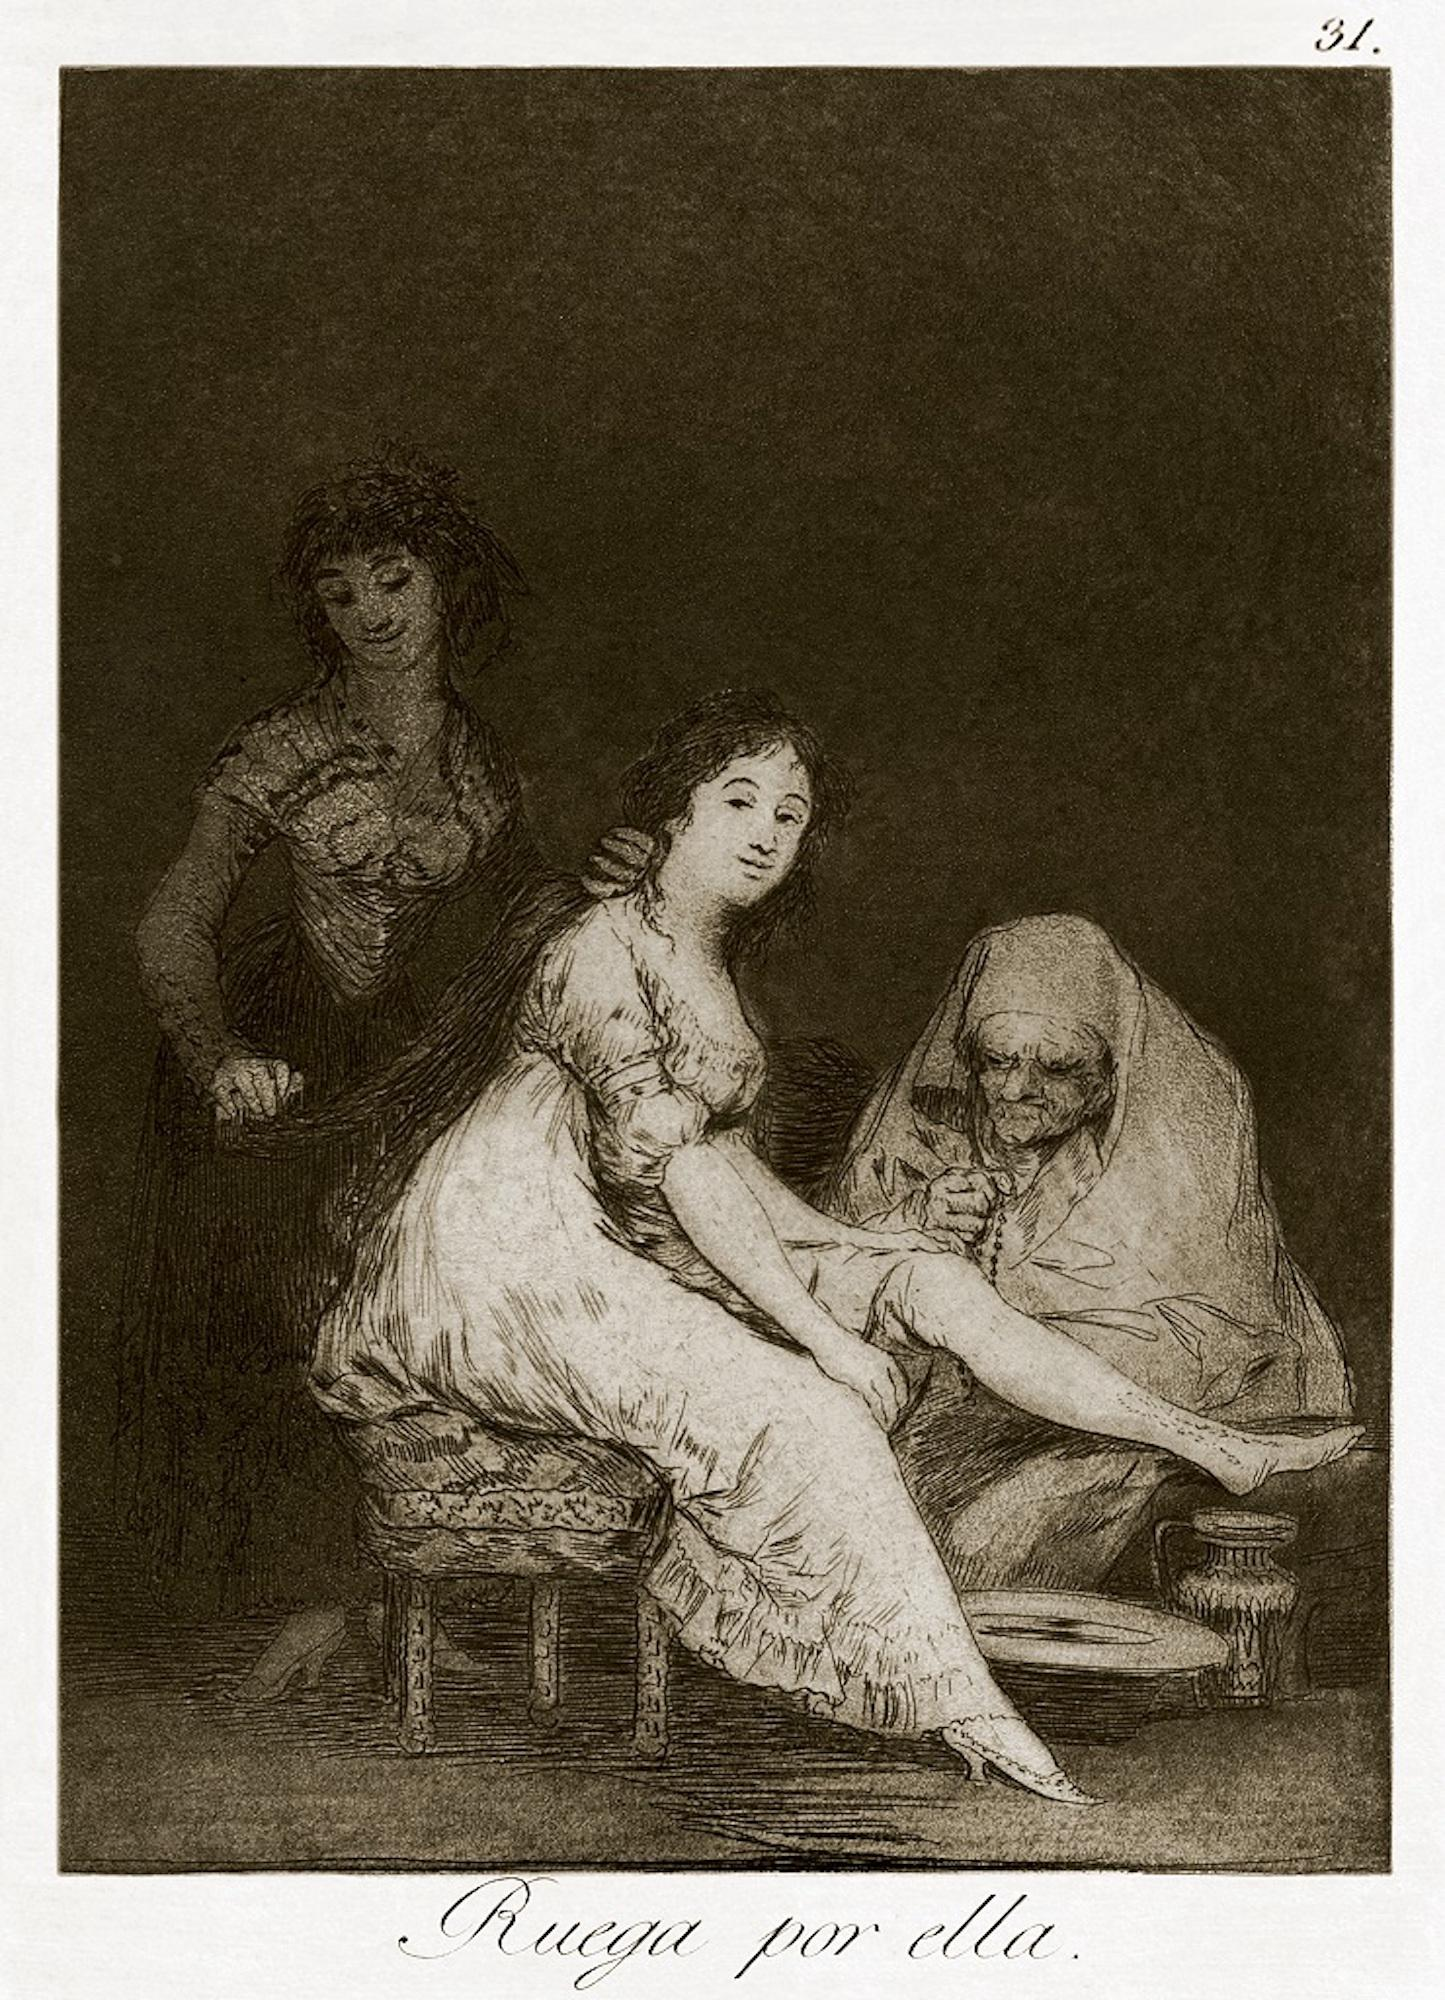 Ruega por Ella  - Origina Etching by Francisco Goya - 1868